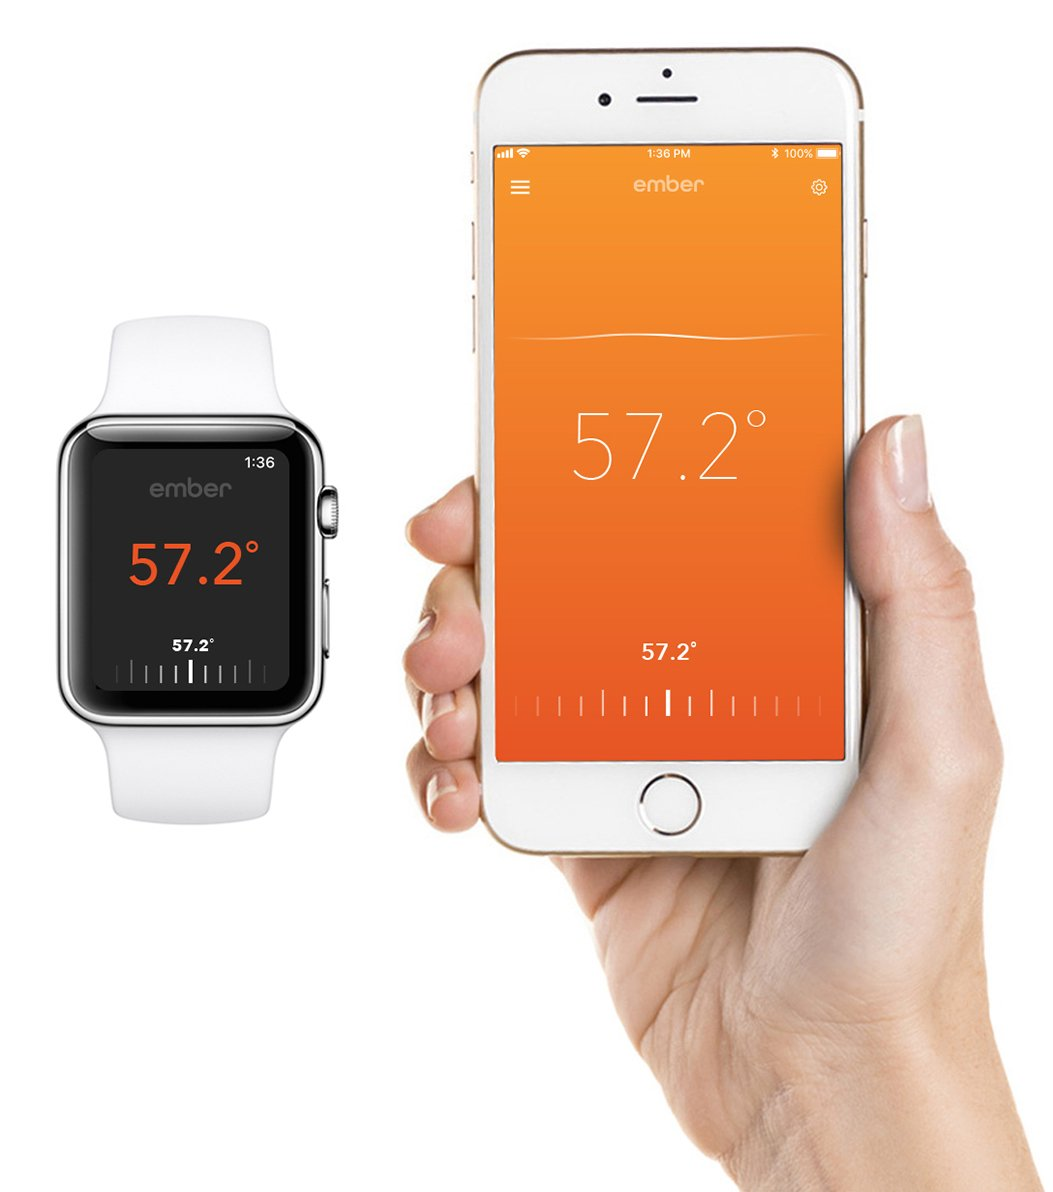 Aplicativo da ember para iPhone e Apple Watch